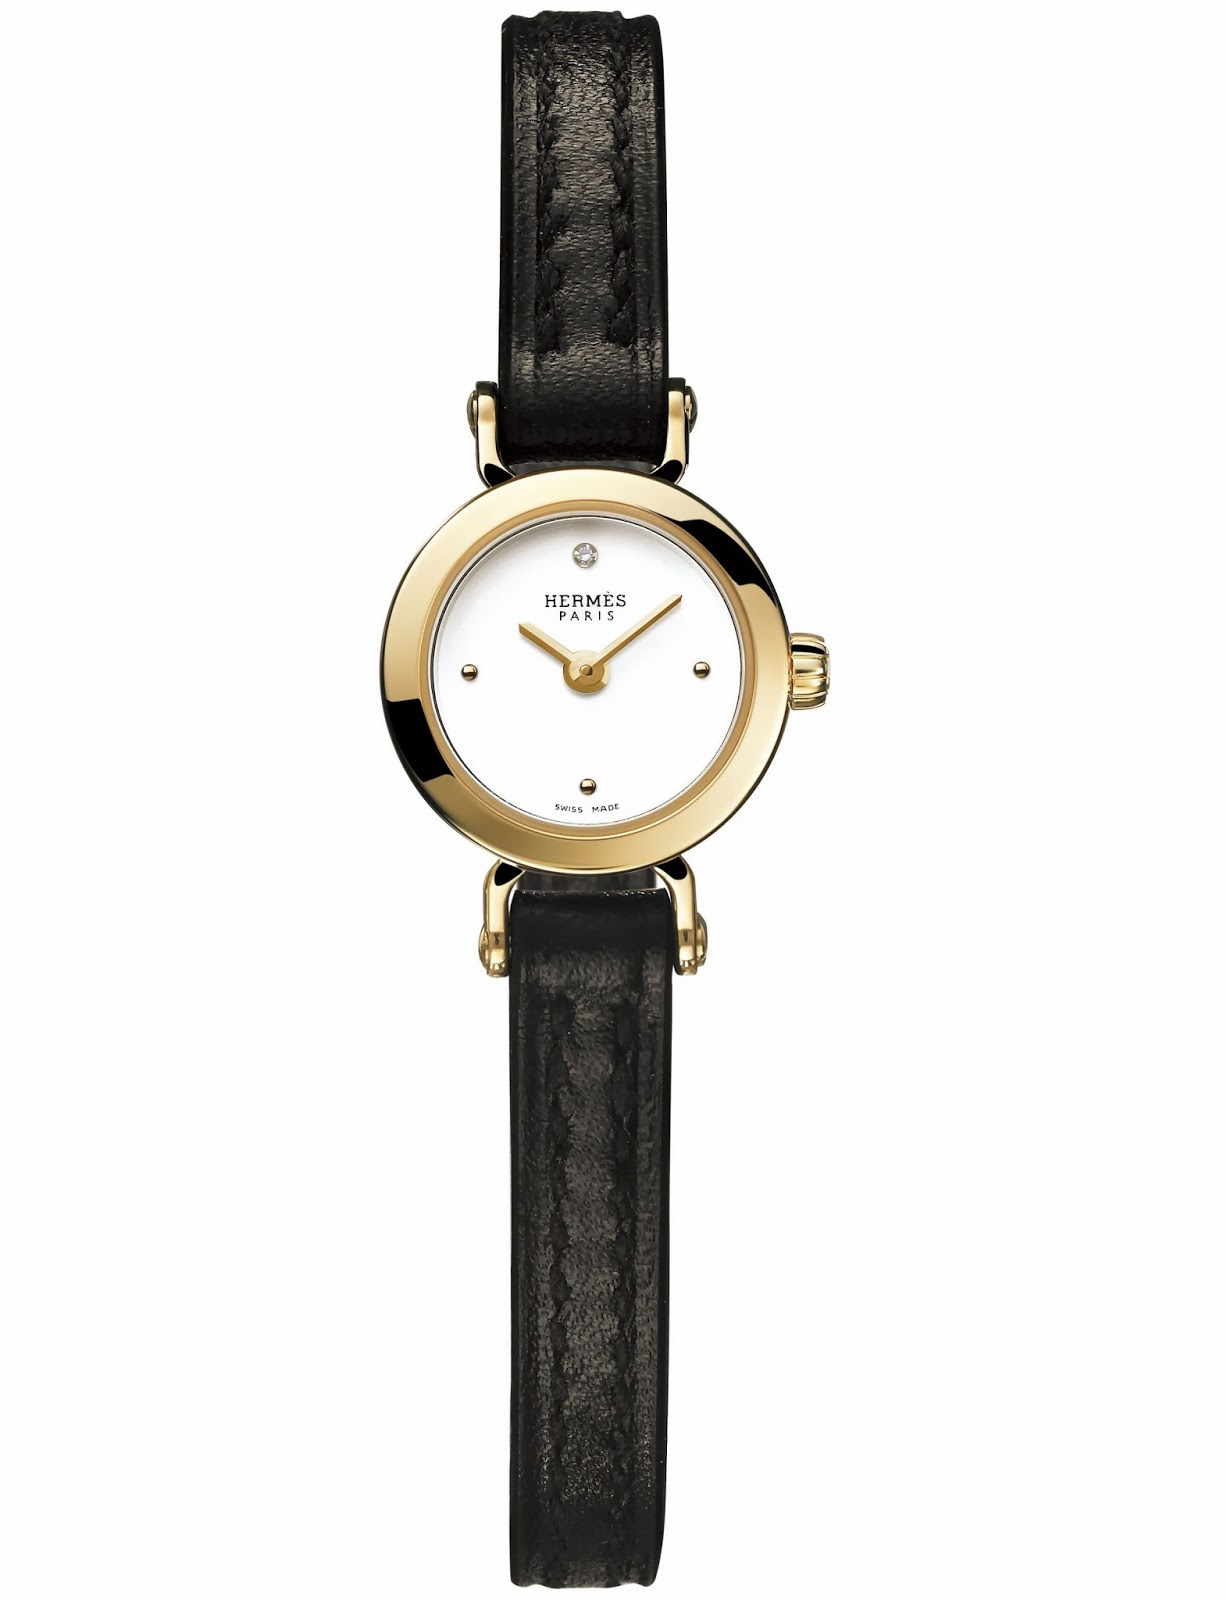 Hermès Faubourg watch gold case